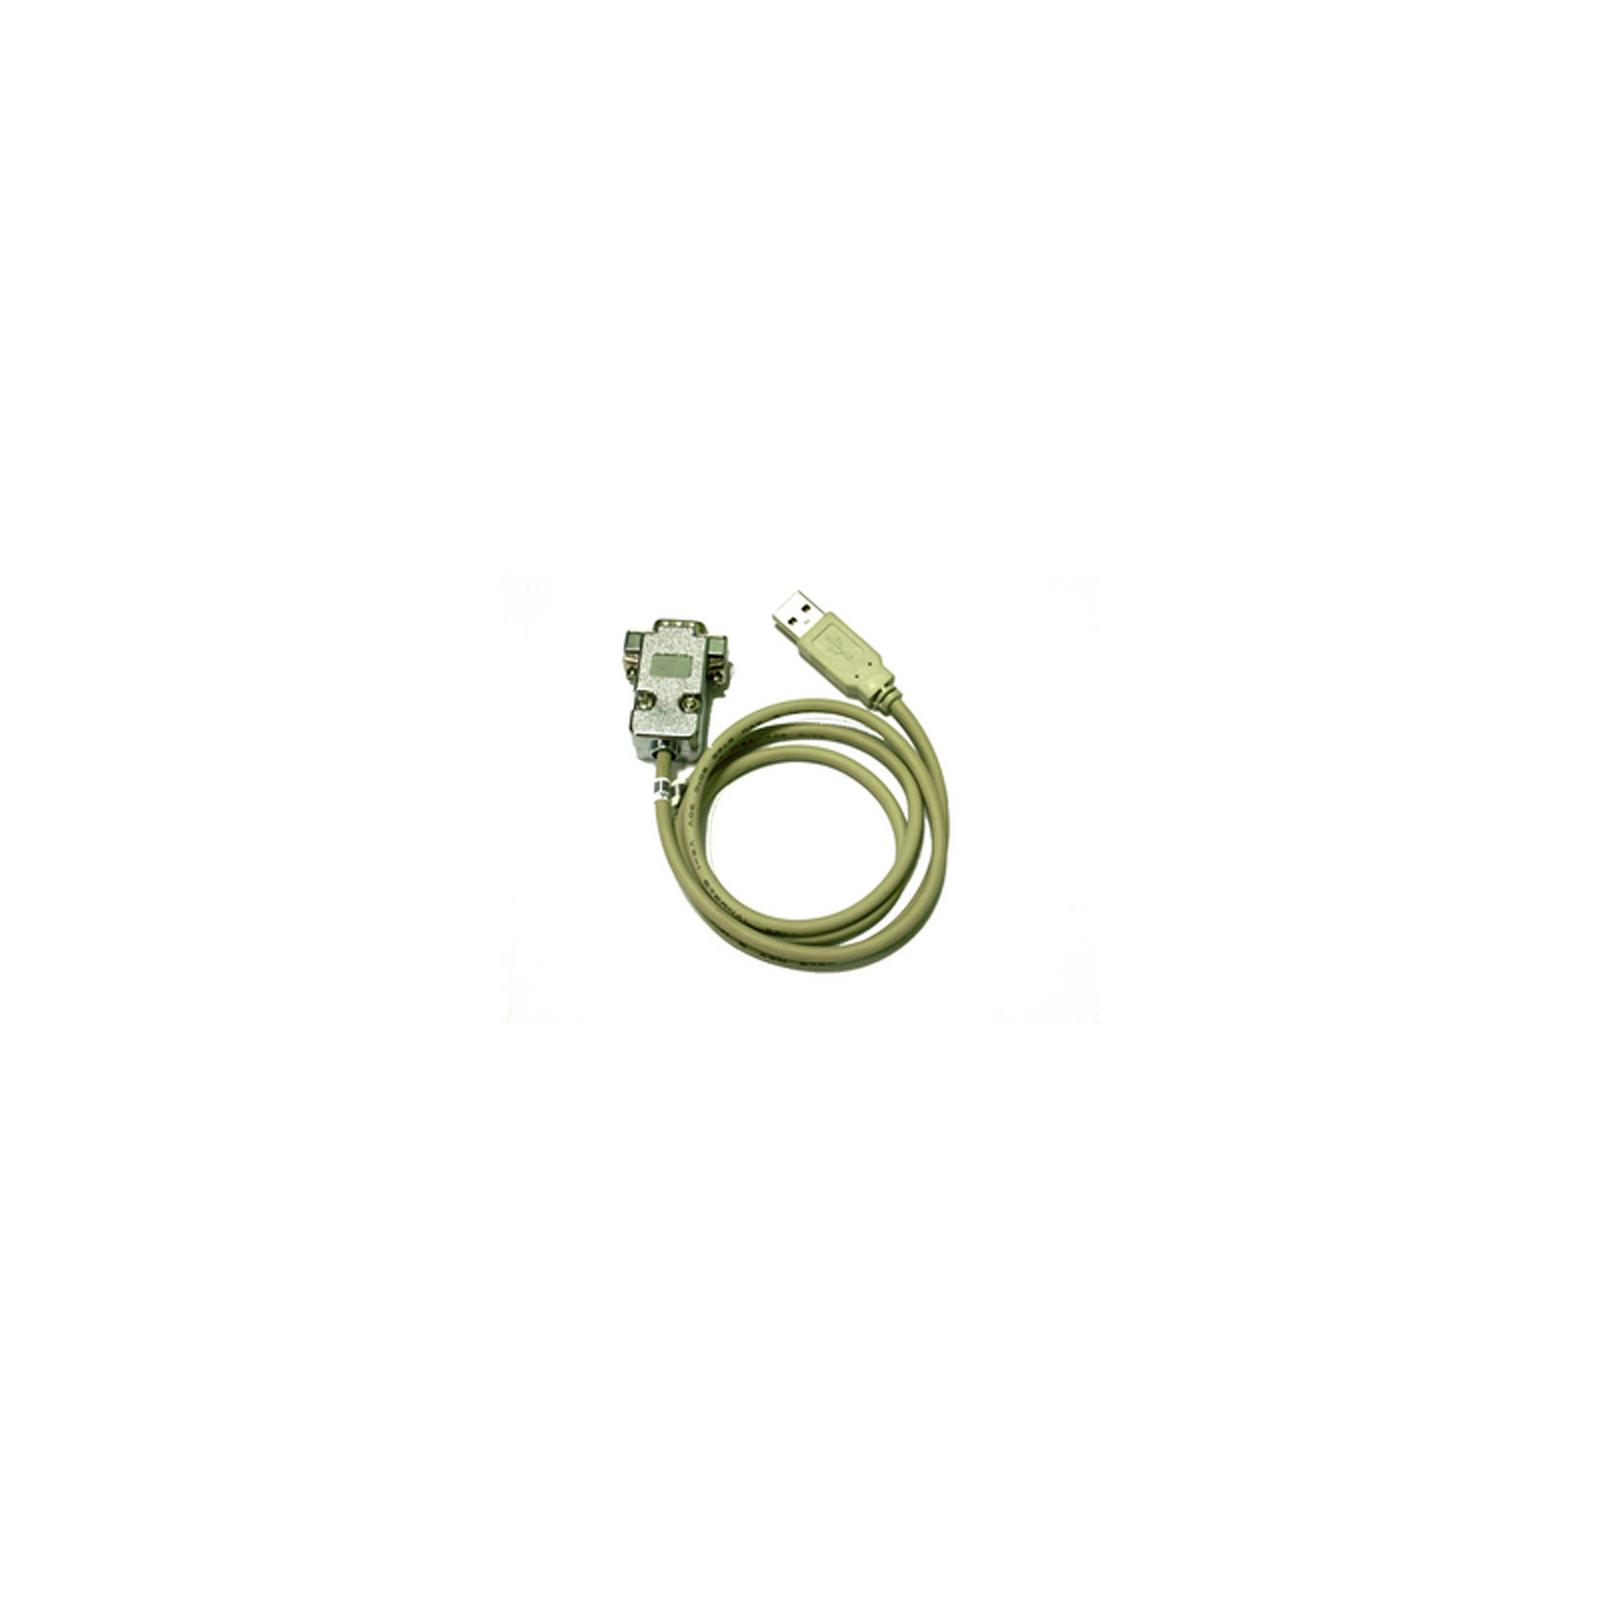 Кабель для передачи данных CP2102 ST-Lab